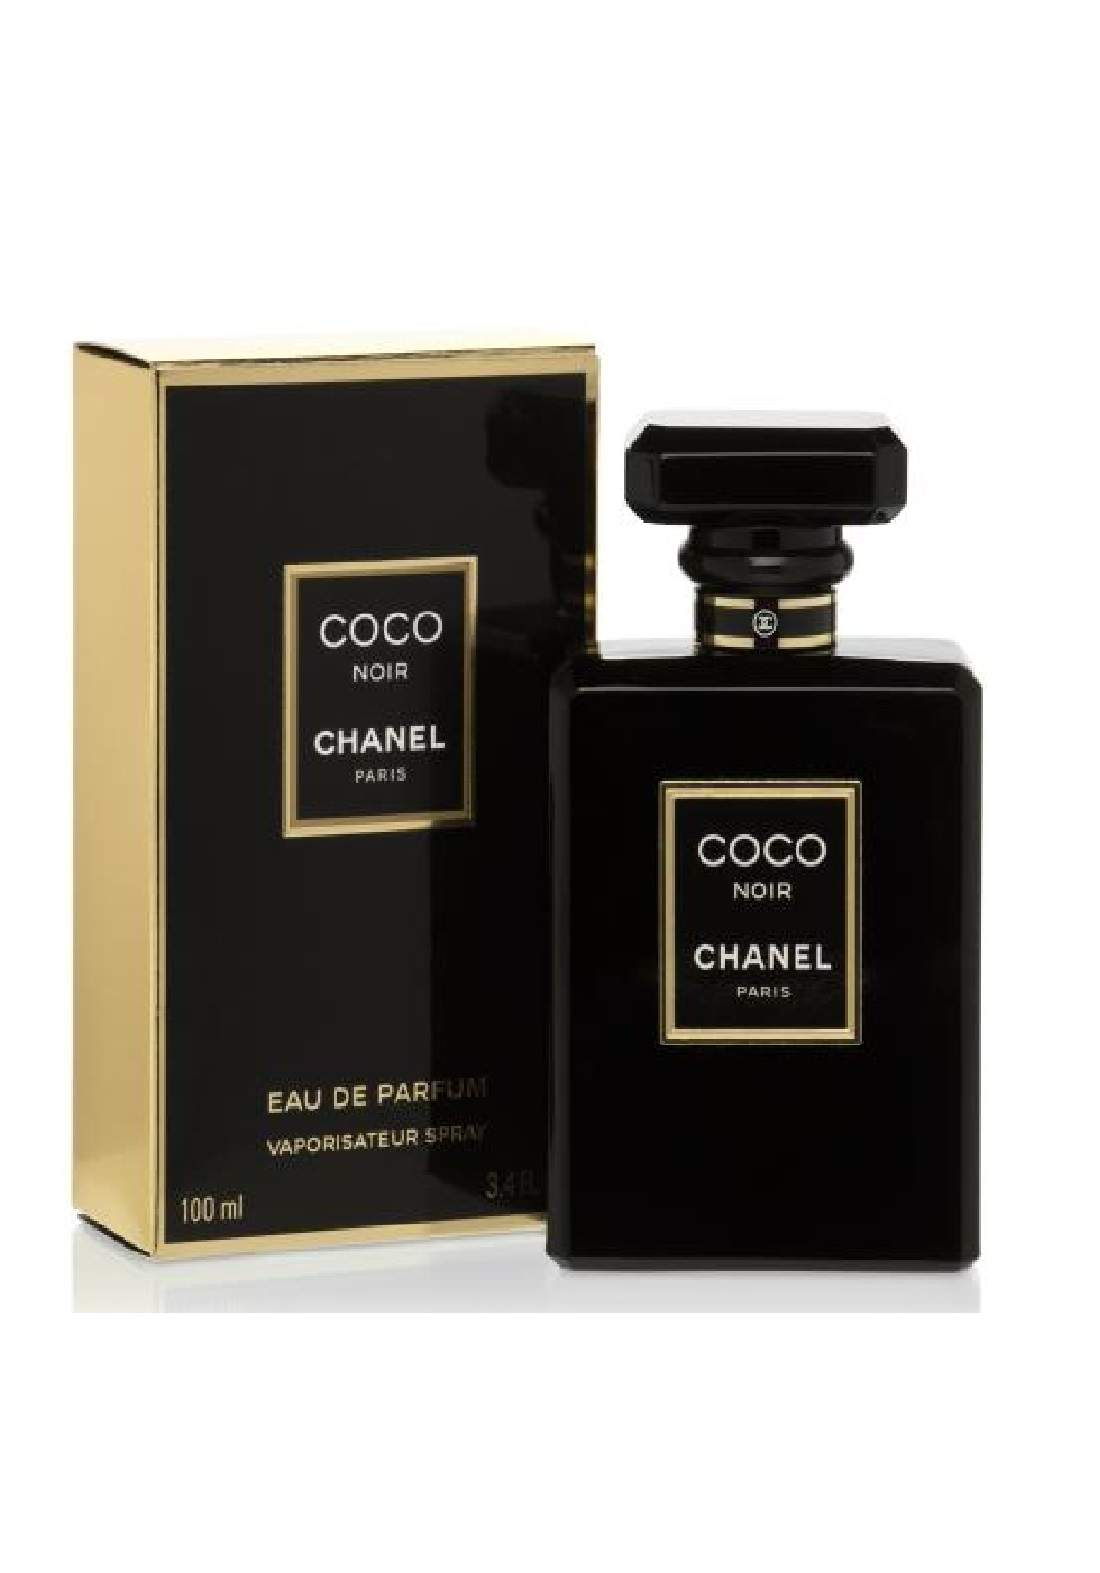 Chanel Coco Noir EDP for Women 100ml عطر نسائي